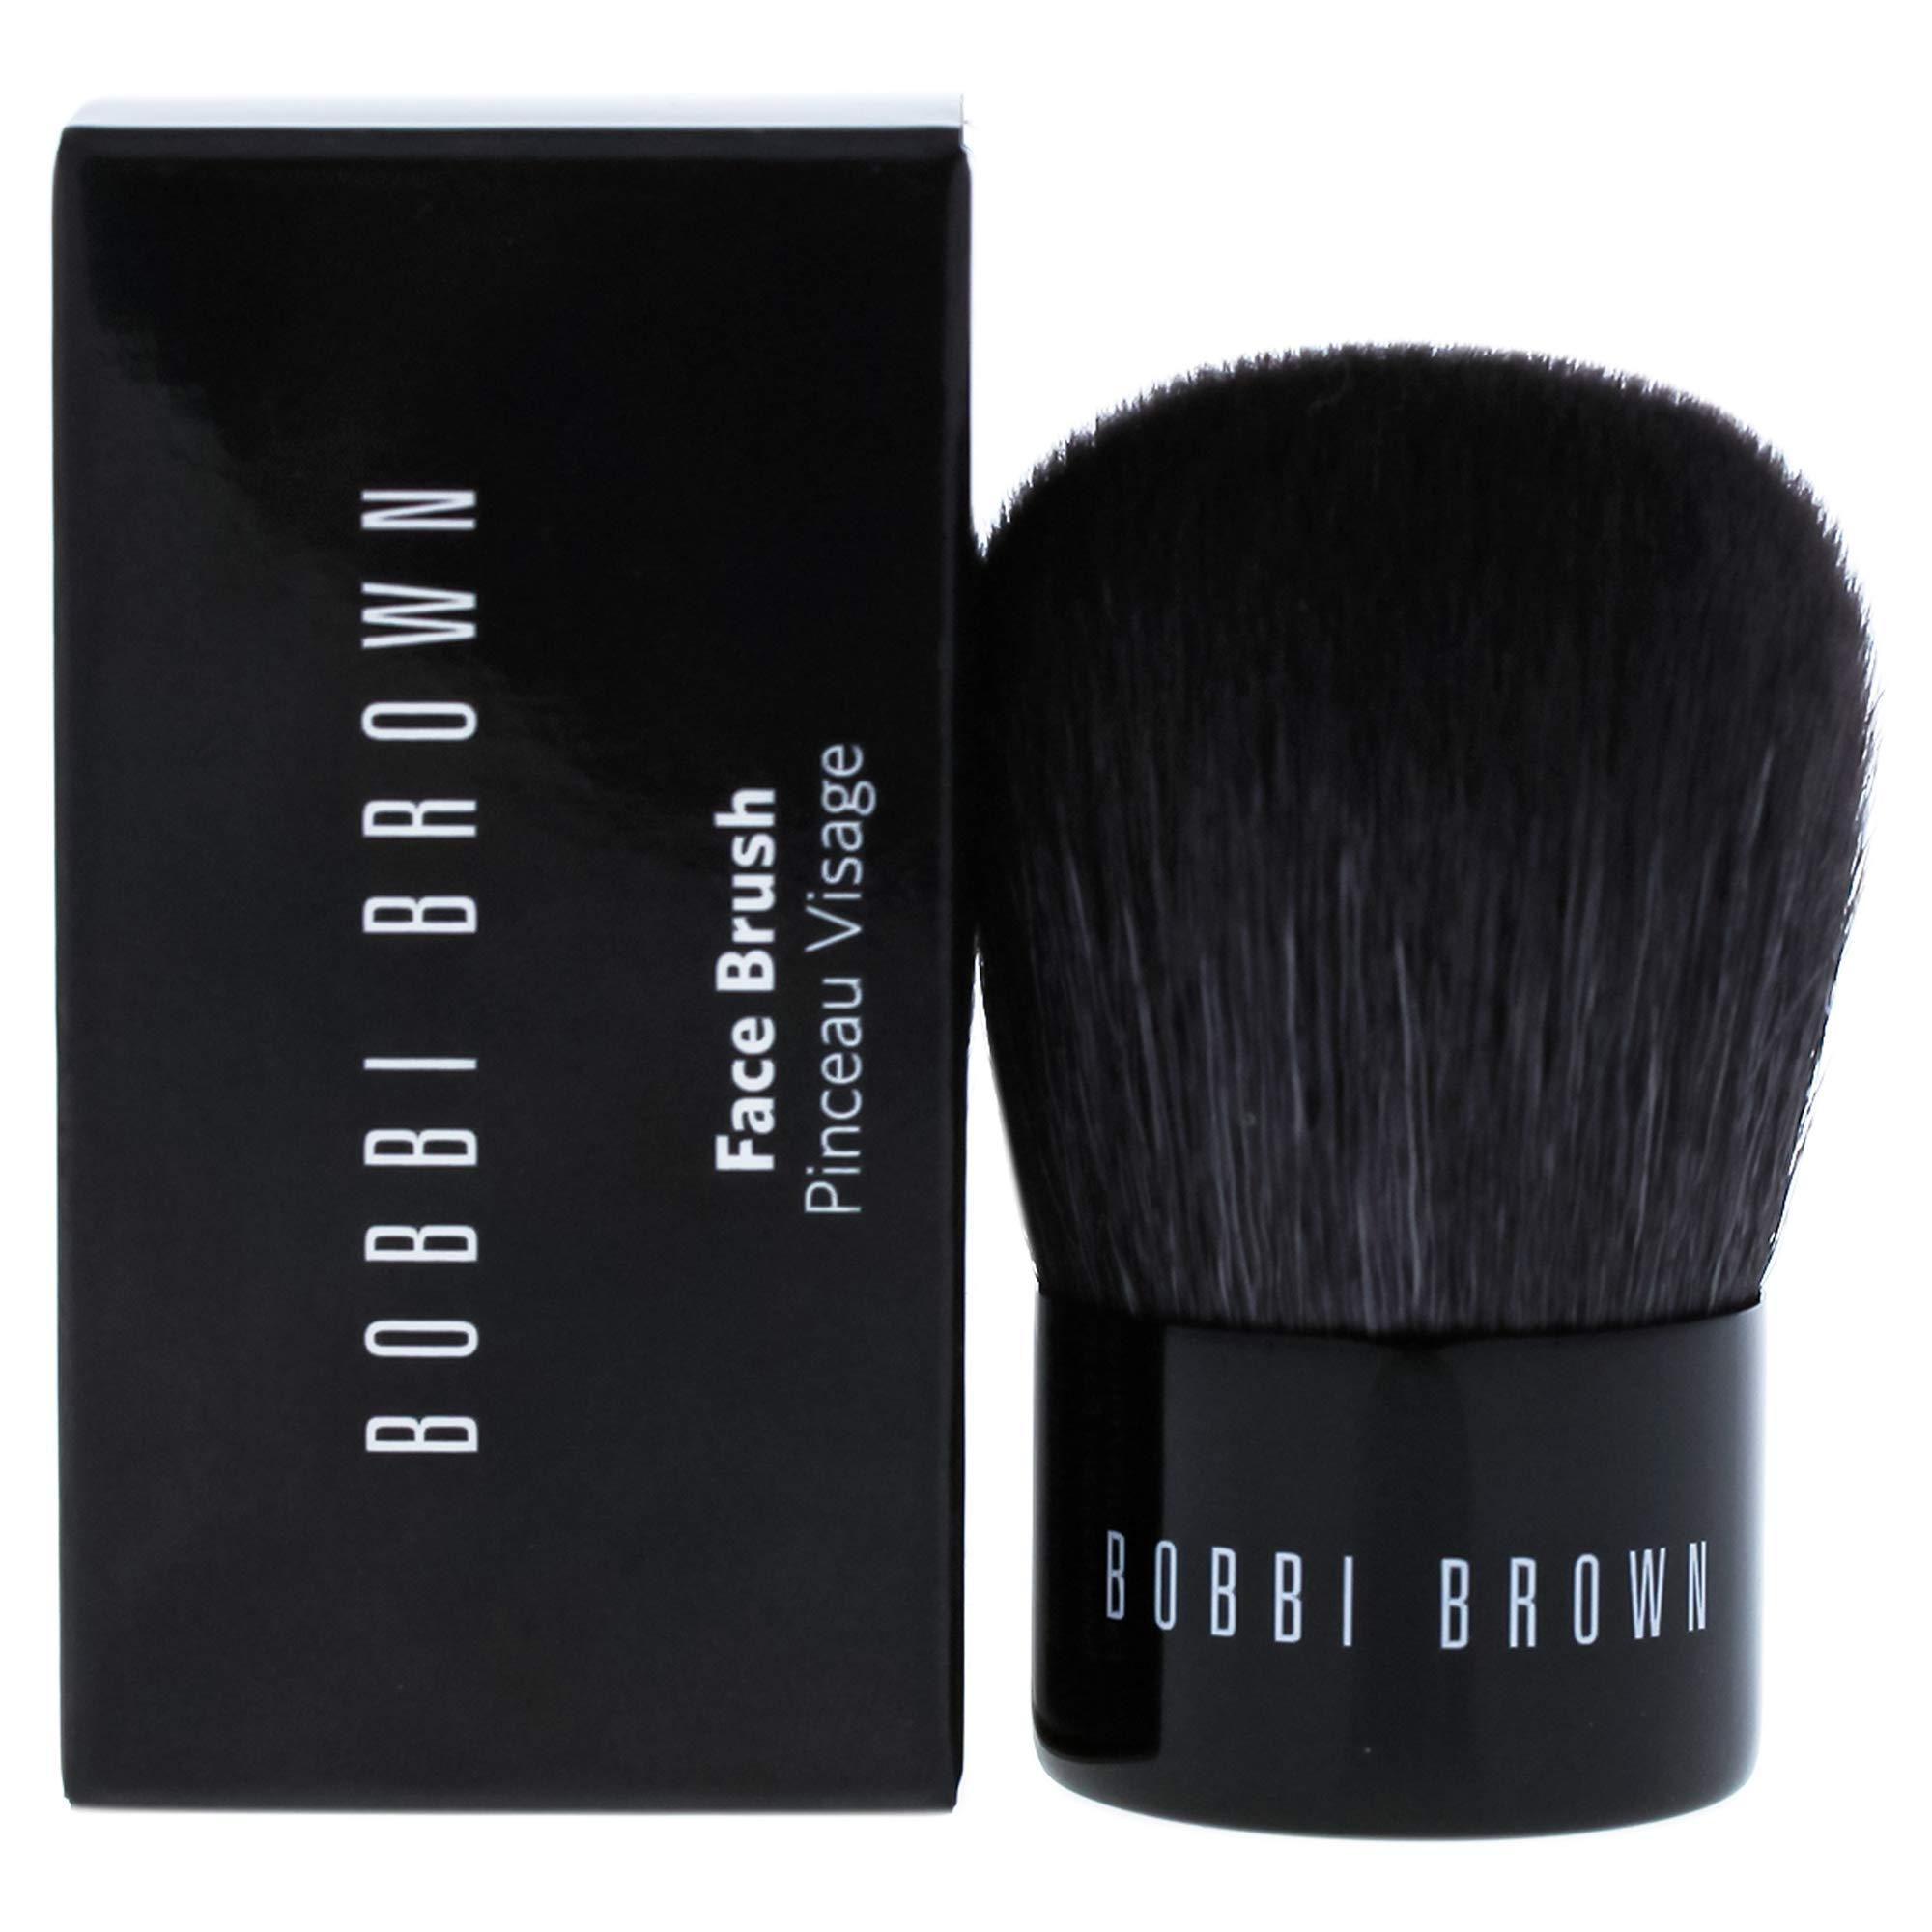 Bobbi Brown Face Brush By Bobbi Brown for Women - 1 Pc Brush